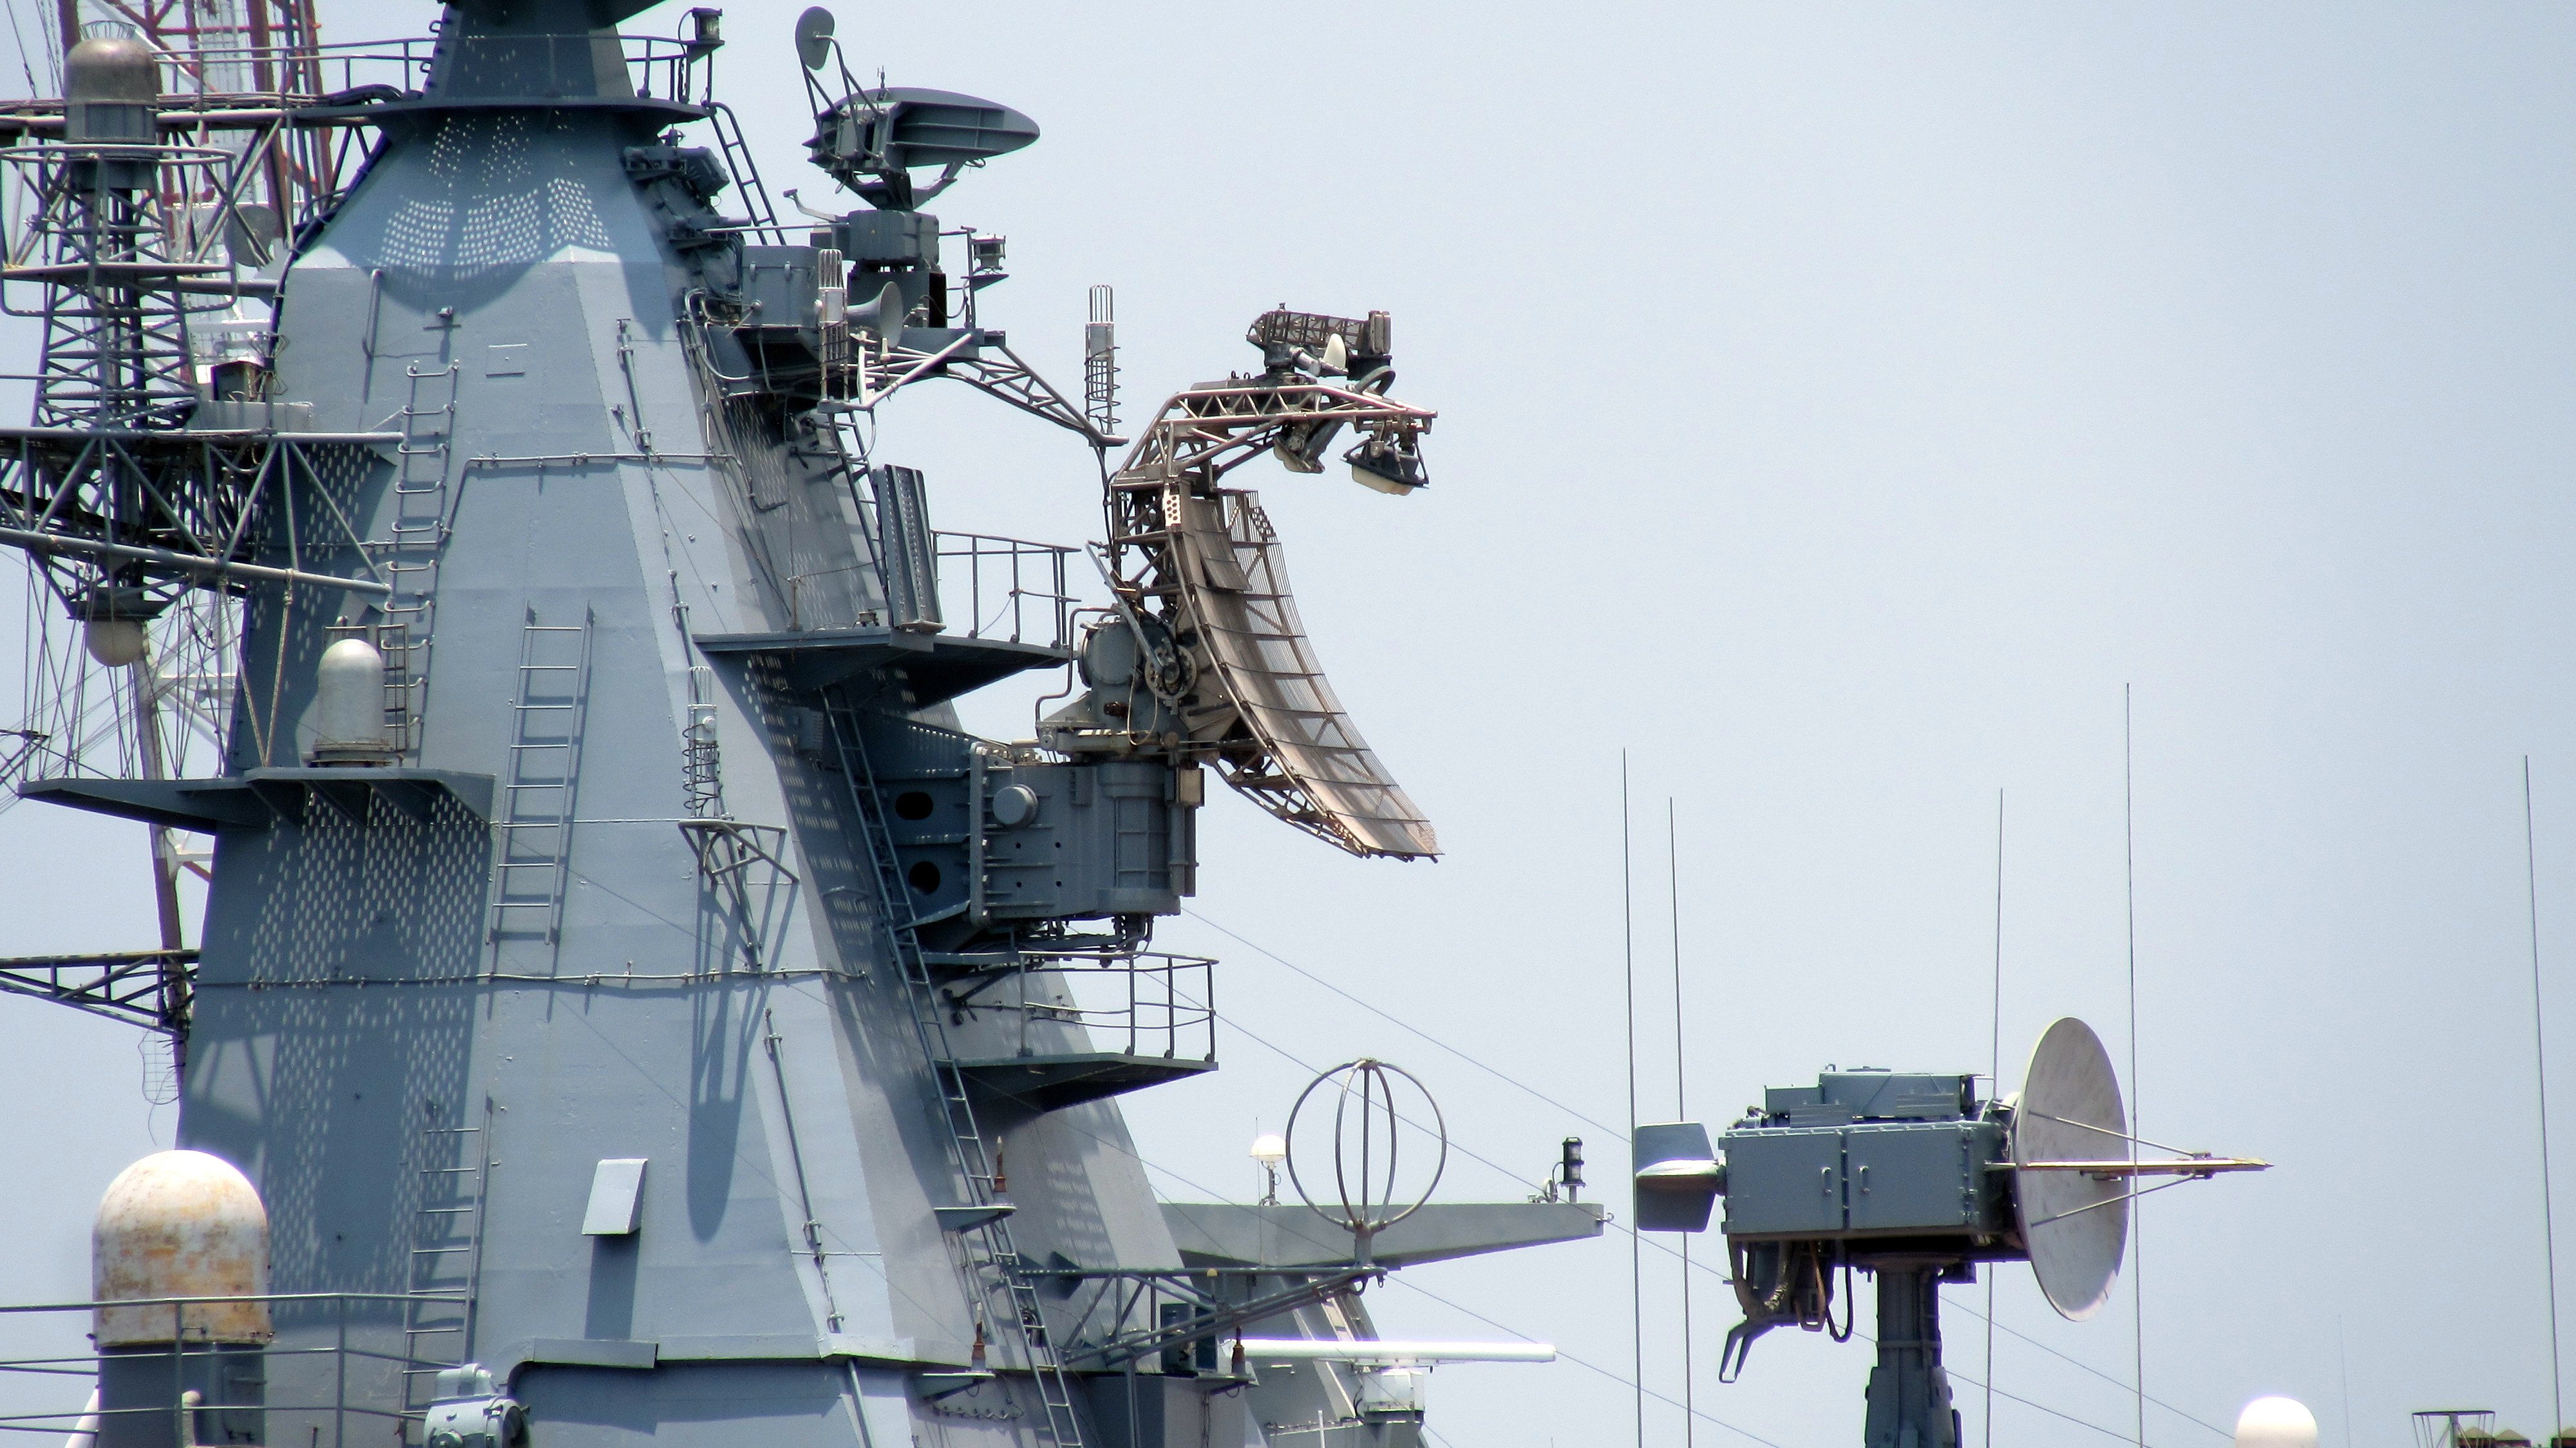 File:The Varyag (011) Cruiser's Argon 1164 Radar.jpg